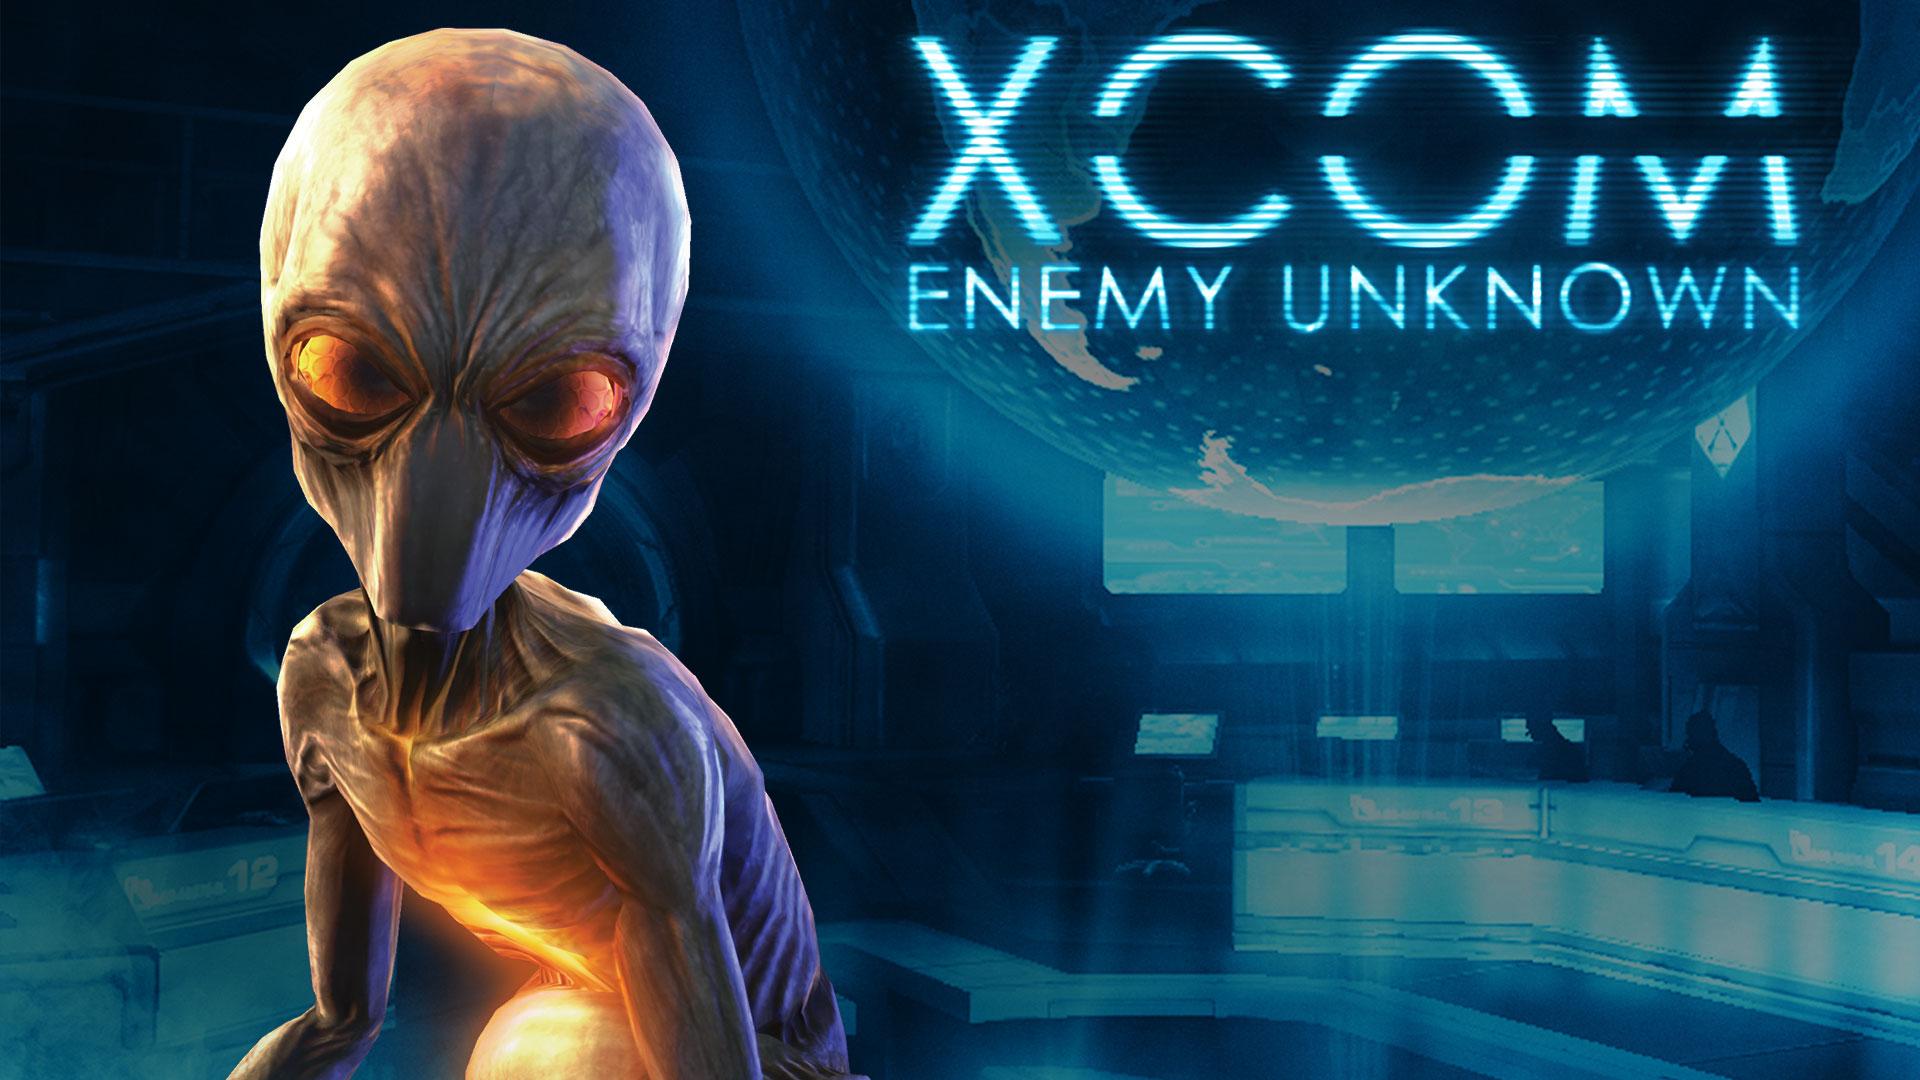 XCOM: Enemy Unknown - Sectoid | Steam Trading Cards Wiki | FANDOM powered by Wikia